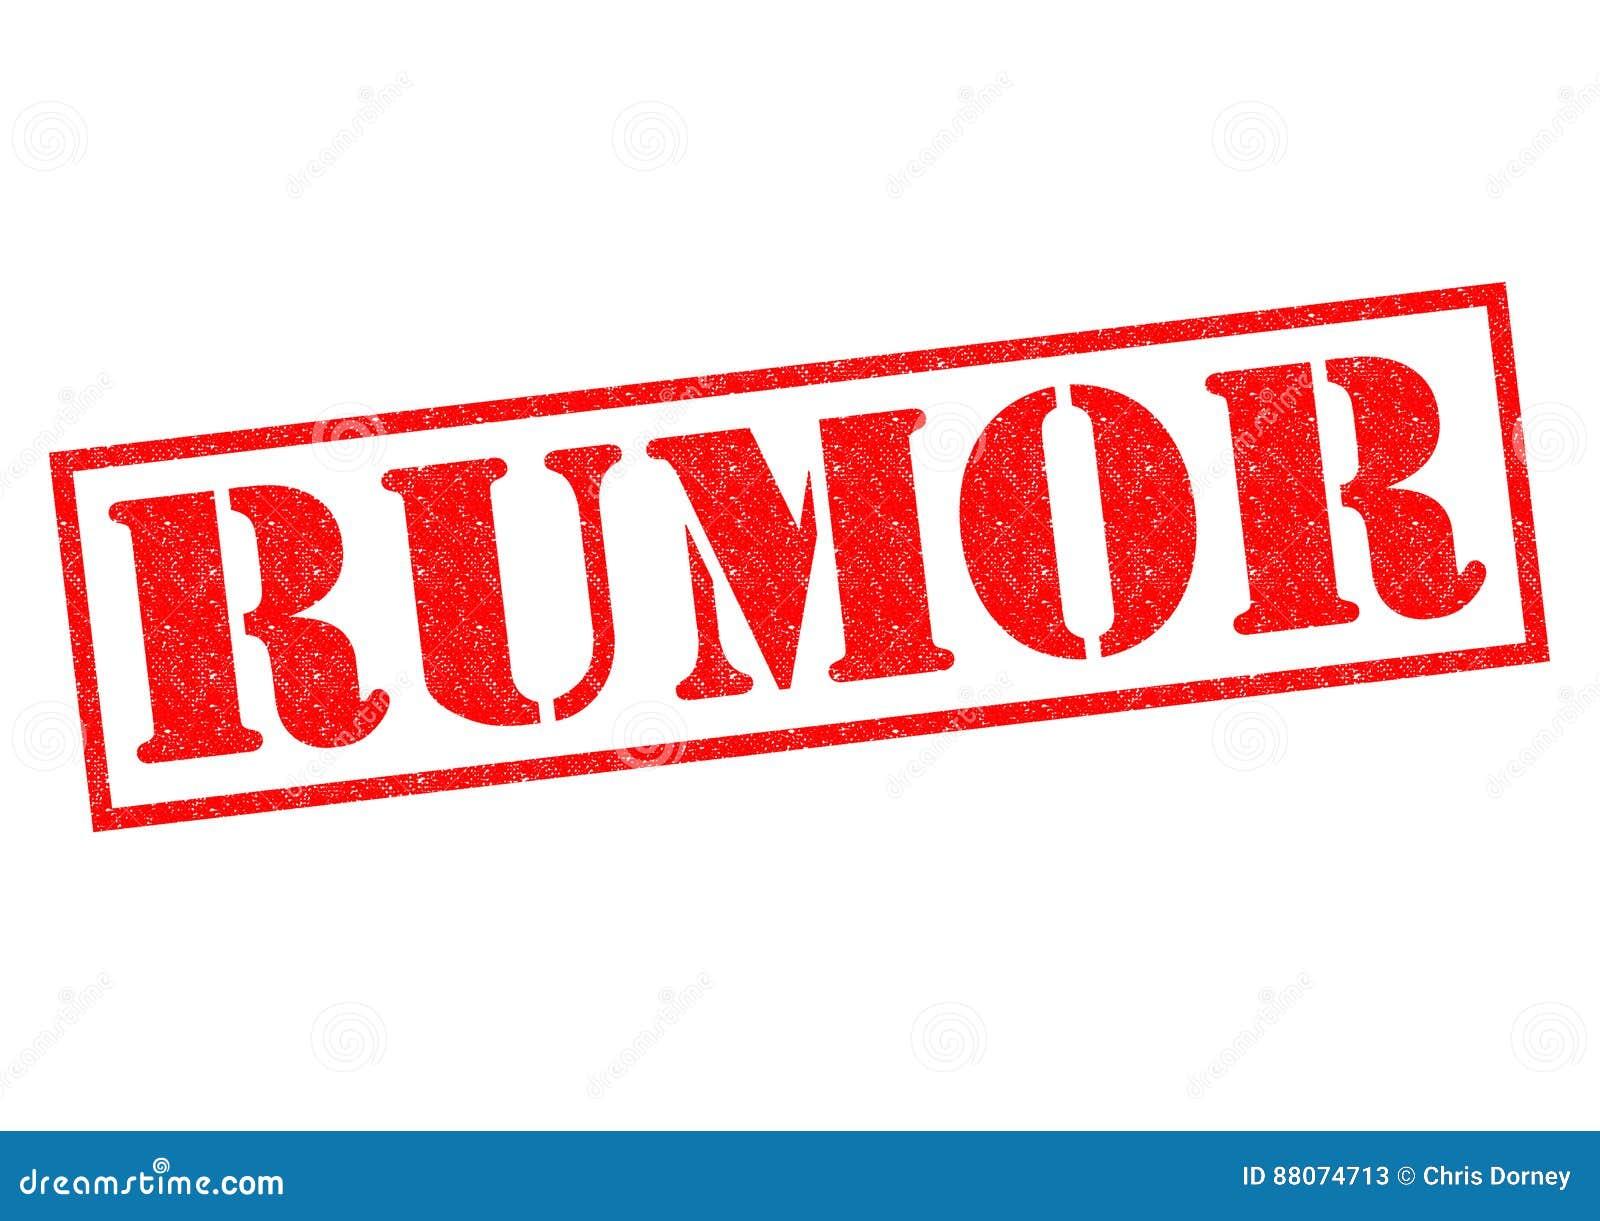 RUMOR stock illustration. Illustration of gossip, rumors ...